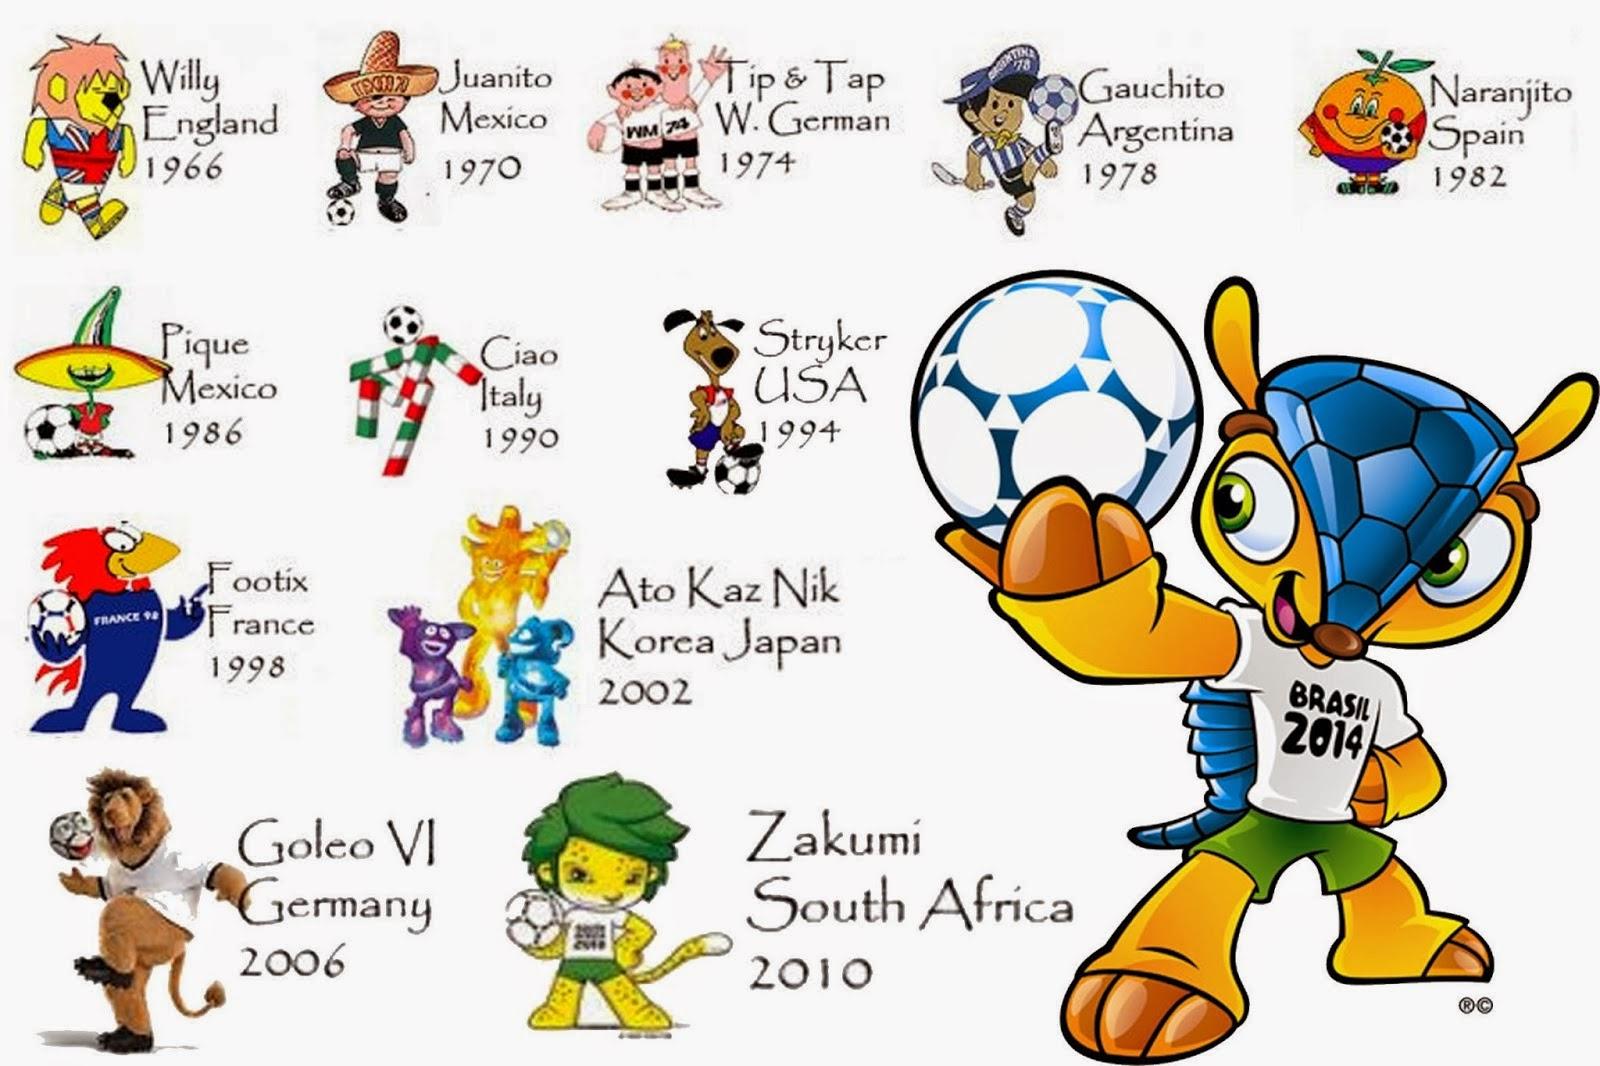 Negara Terbanyak Juara Piala Dunia Sepanjang Sejarah